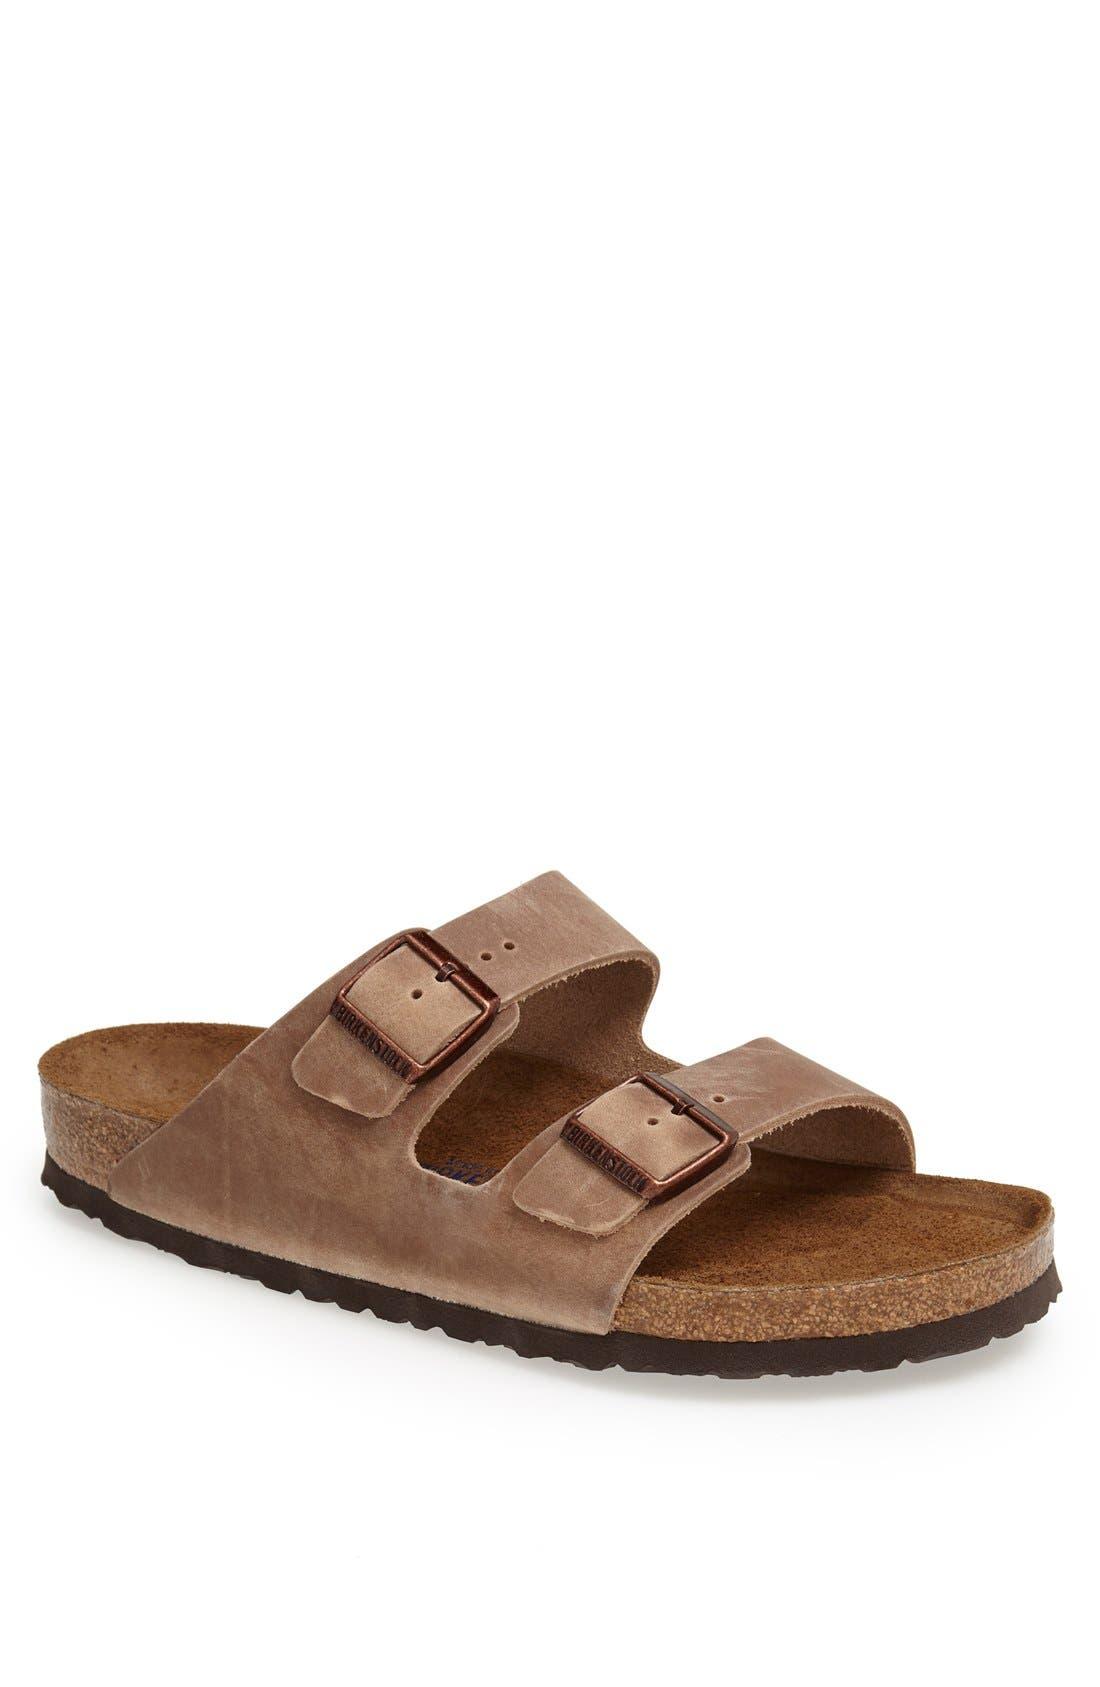 Birkenstock Arizona Soft Slide Sandal,7.5 - Brown